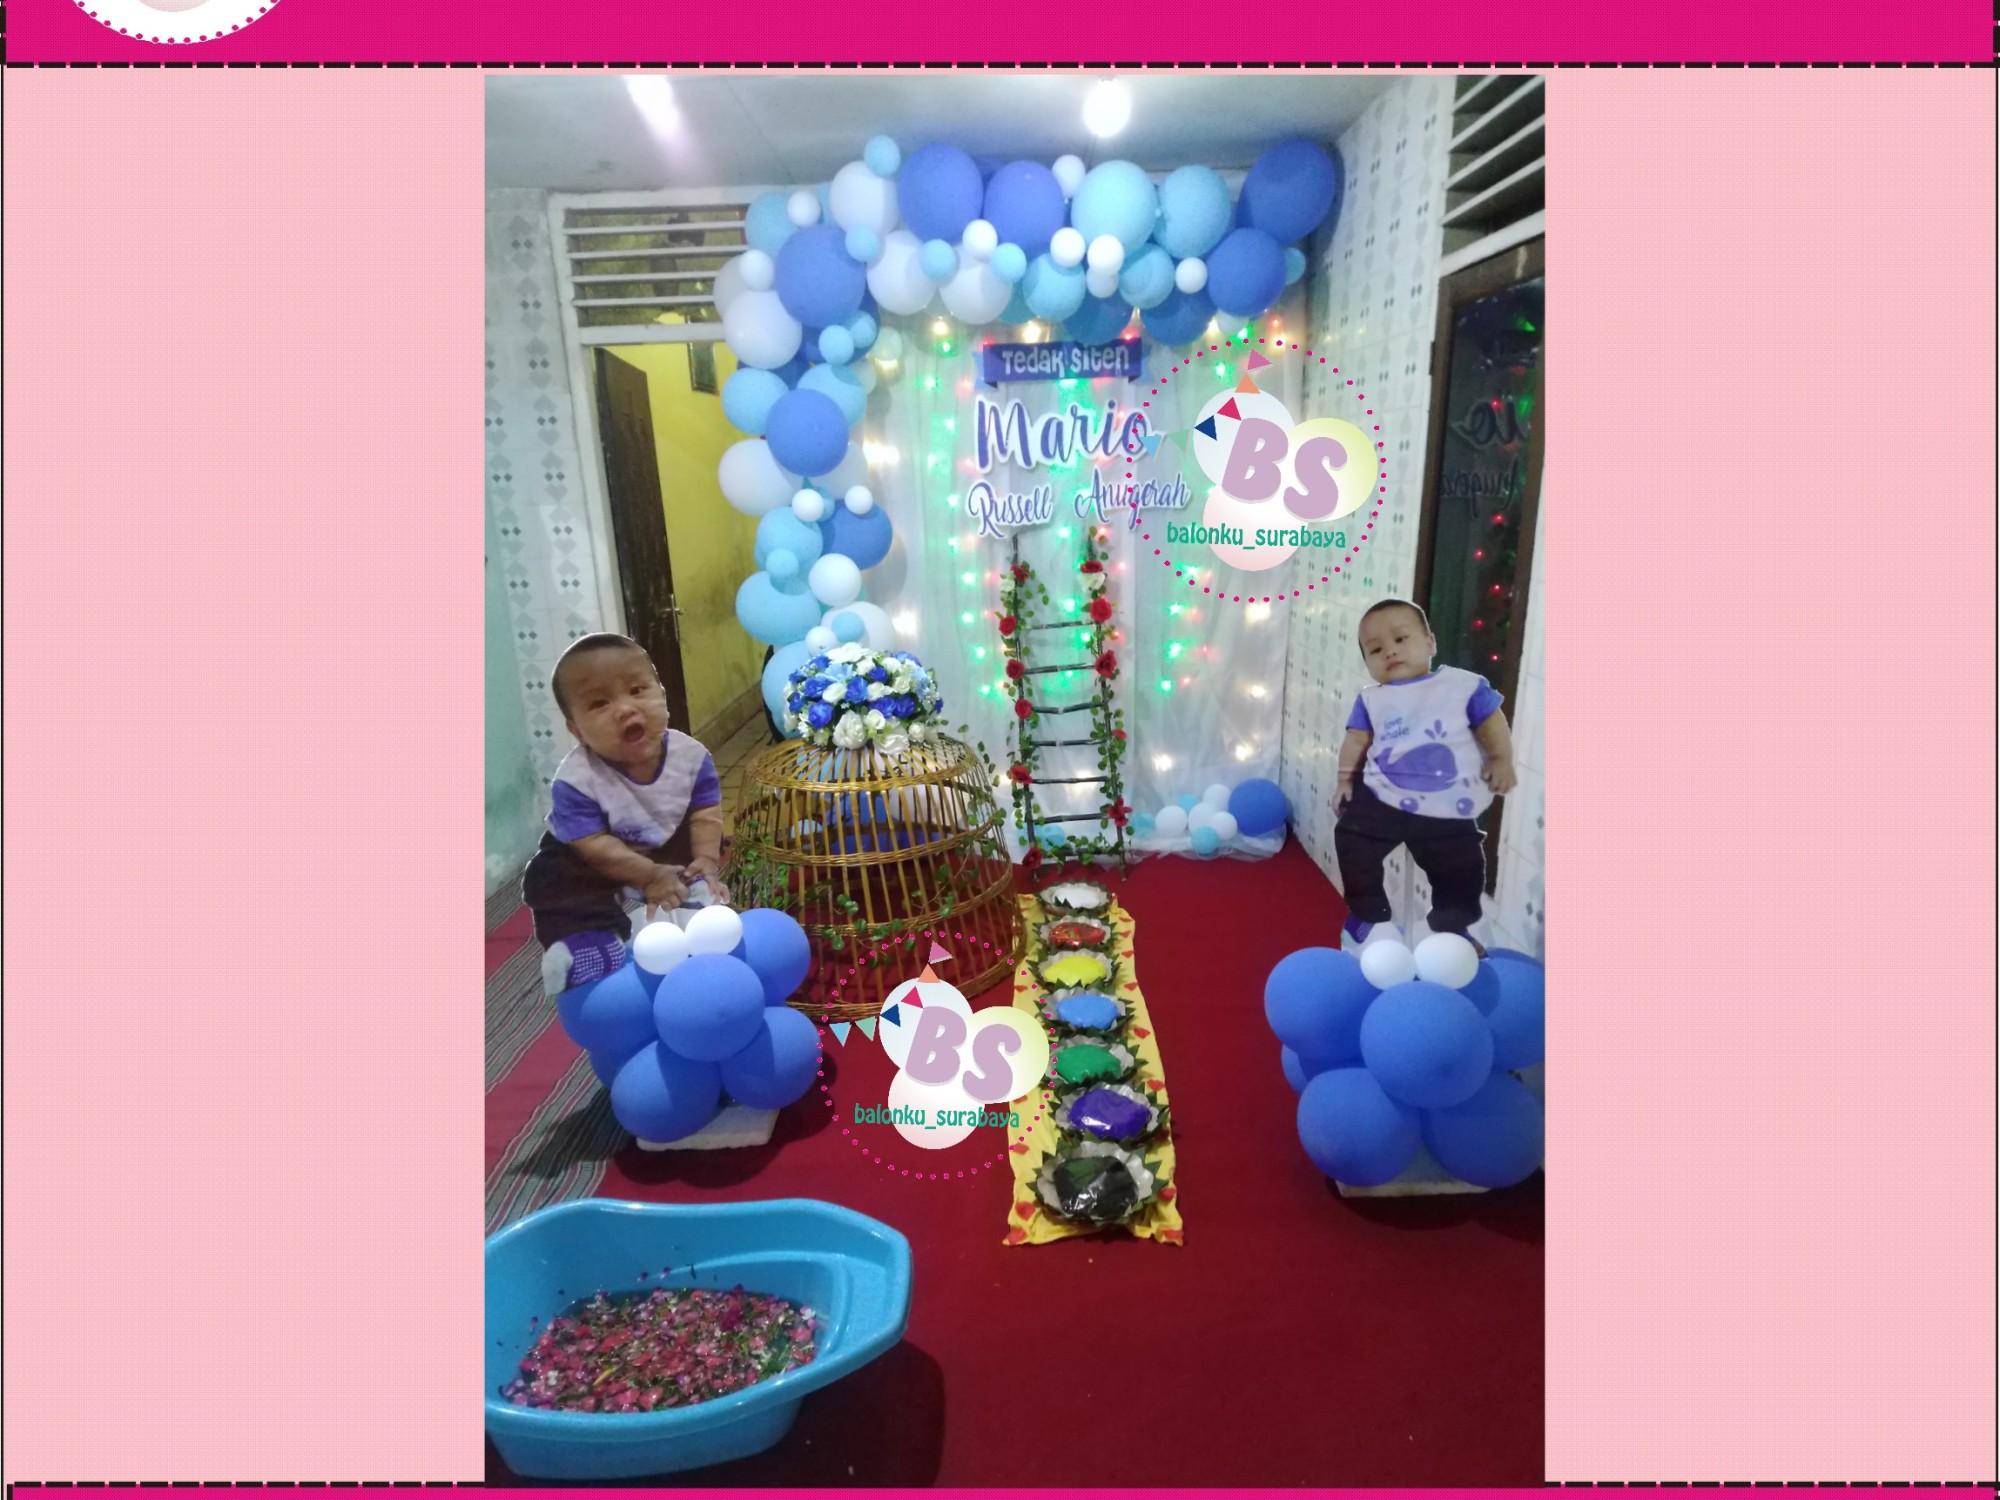 BAlon Gas,Bunga dekorasi,Rangkaian bunga artificial, Buket bunga, buket bunga mawar, harga buket bunga,Balon sablon, balon Printing, balon promosi, , Perlengkapan ulang tahun, Balon latex , balon doff, balon latex, balon doff merah, balon natal, balon agustusan, balon dekorasi, balonku Surabaya, 085733133529, dekorasi tedak siten